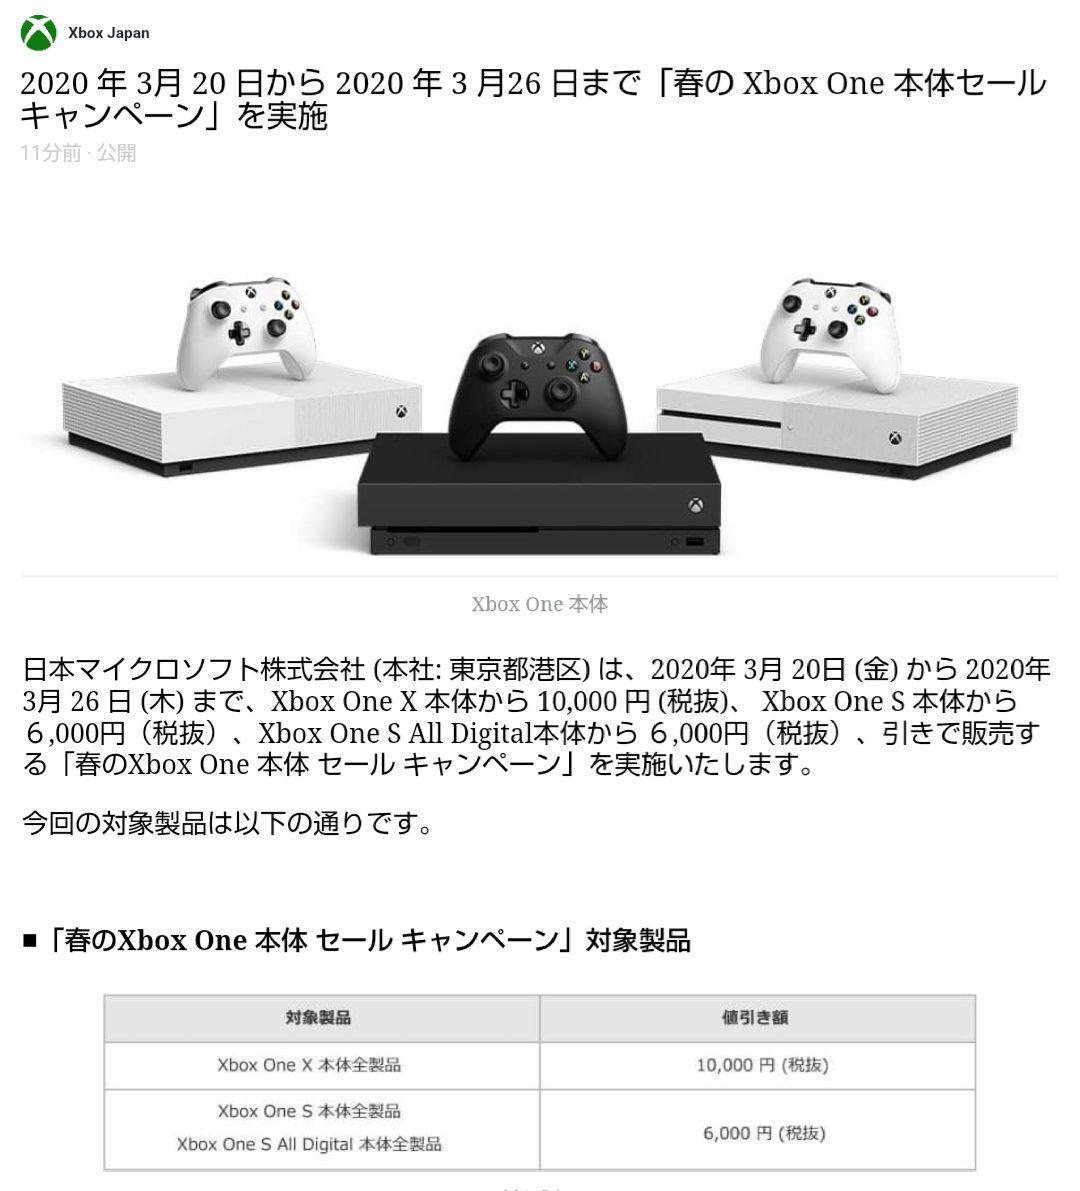 AEW99UT - 【速報】Xbox One X価格変更キタ━━━━(゚∀゚)━━━━!!